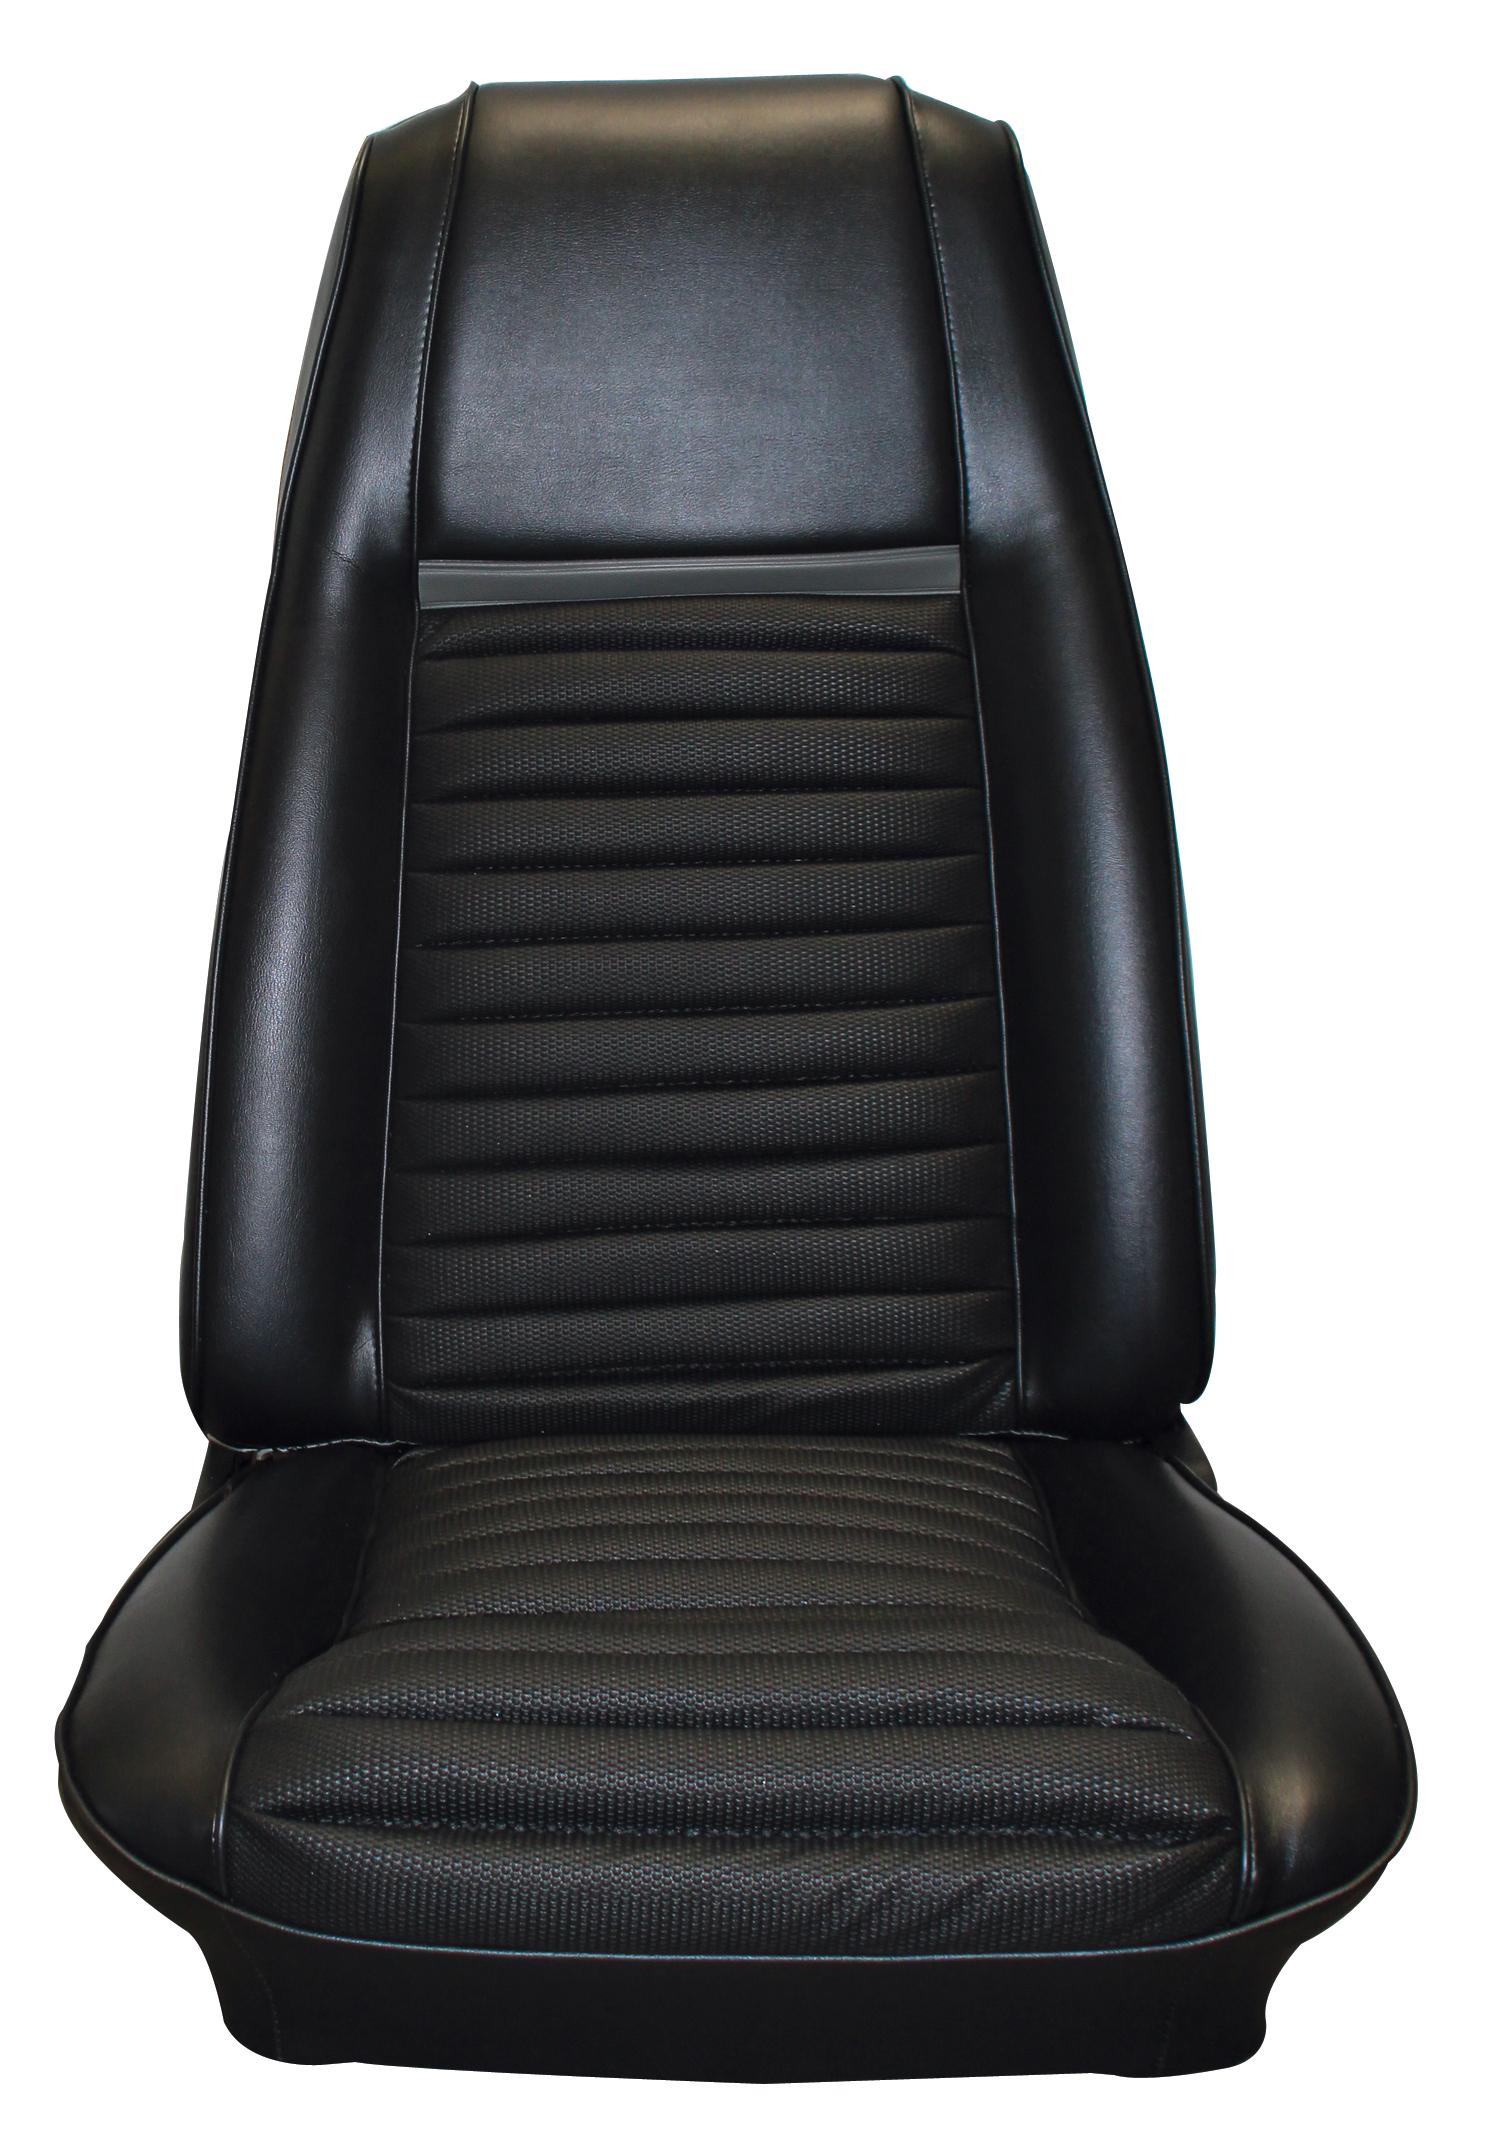 1970 Mach 1 Front Buckets Seats Autoware